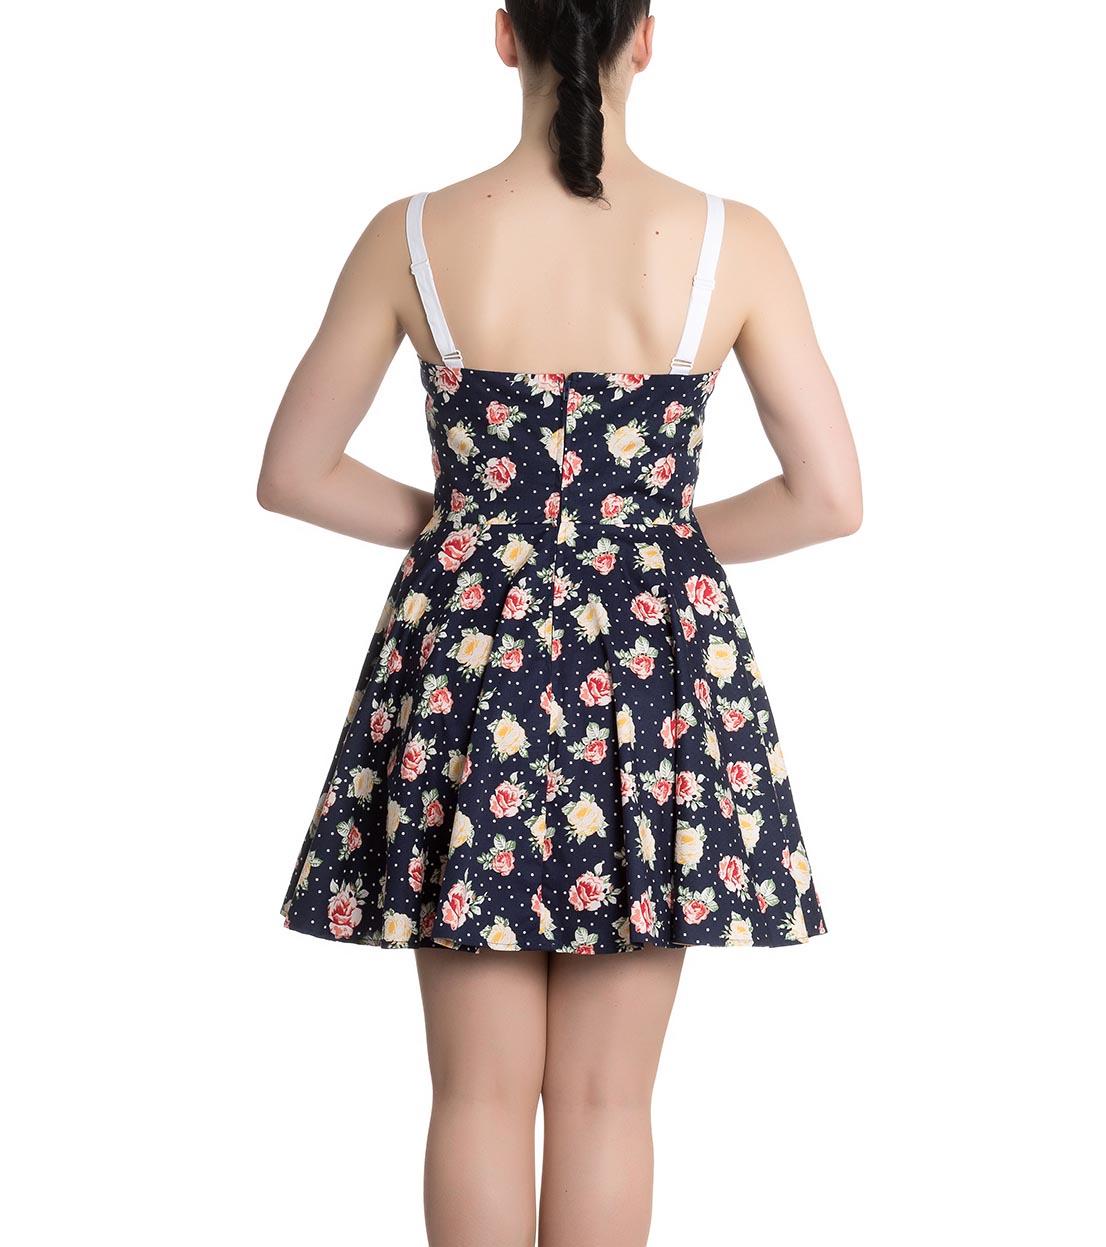 Hell-Bunny-Navy-Blue-Floral-Roses-Flowers-Mini-Dress-EMMA-Polka-Dot-All-Sizes thumbnail 9